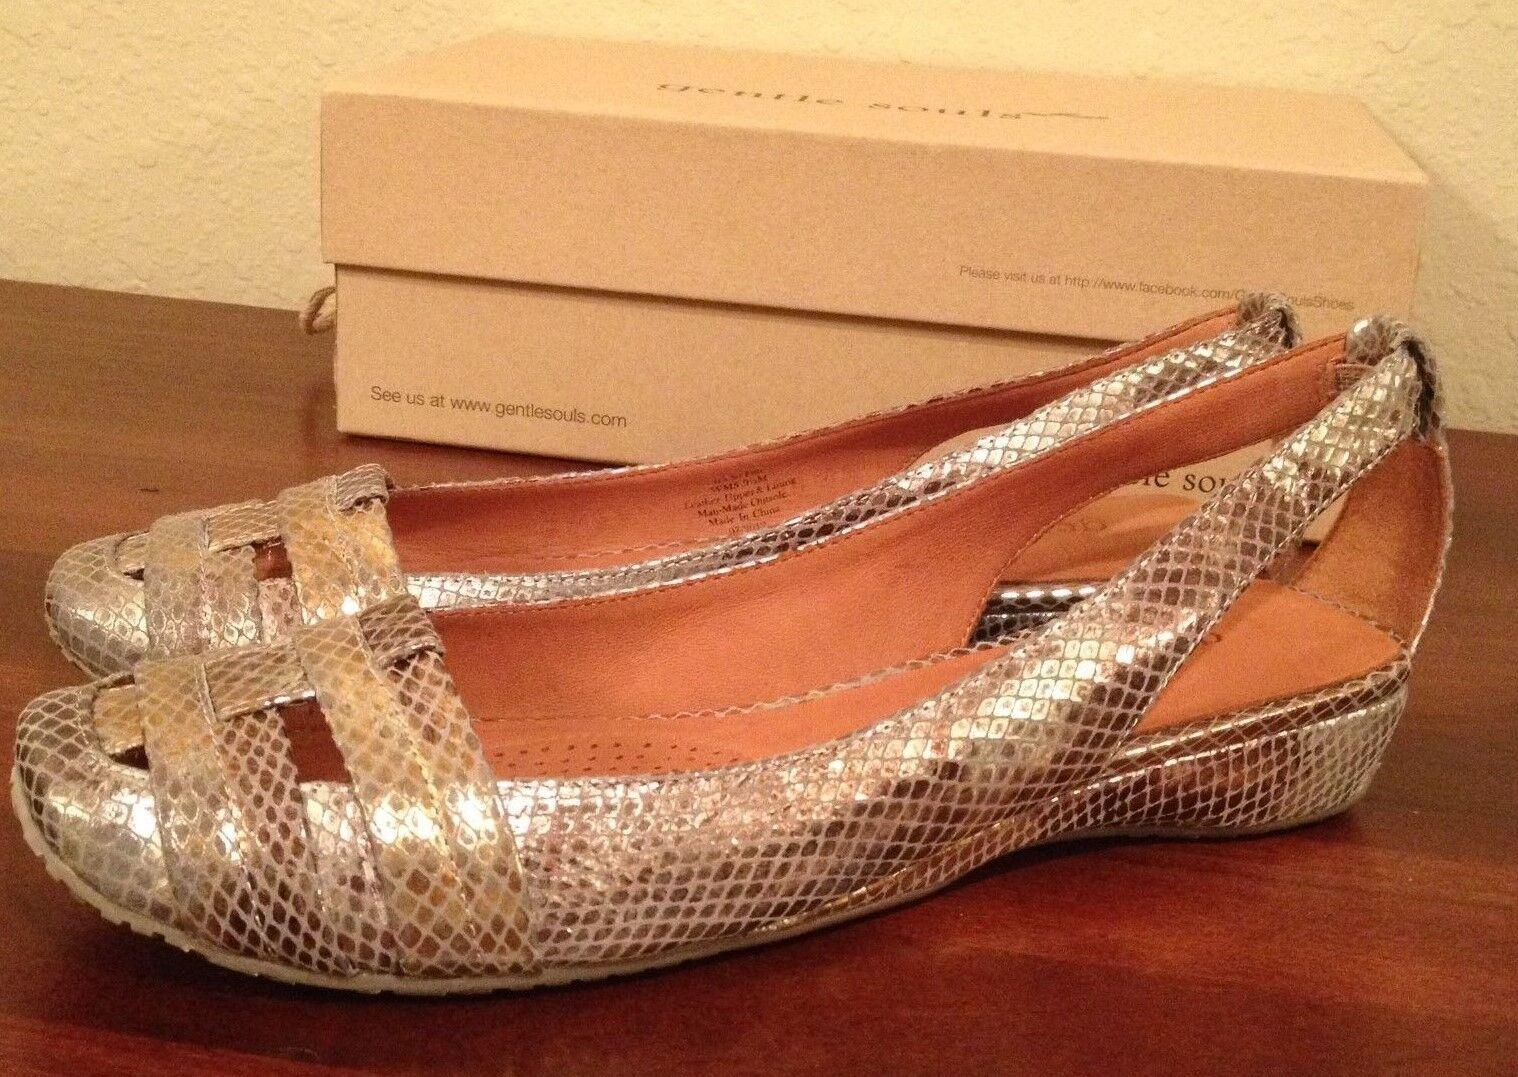 NIB  185 GOLD Gentle Souls It's So Fun GOLD 185 Shoes Donna size 9.5 M  9 1/2 M 7ed788